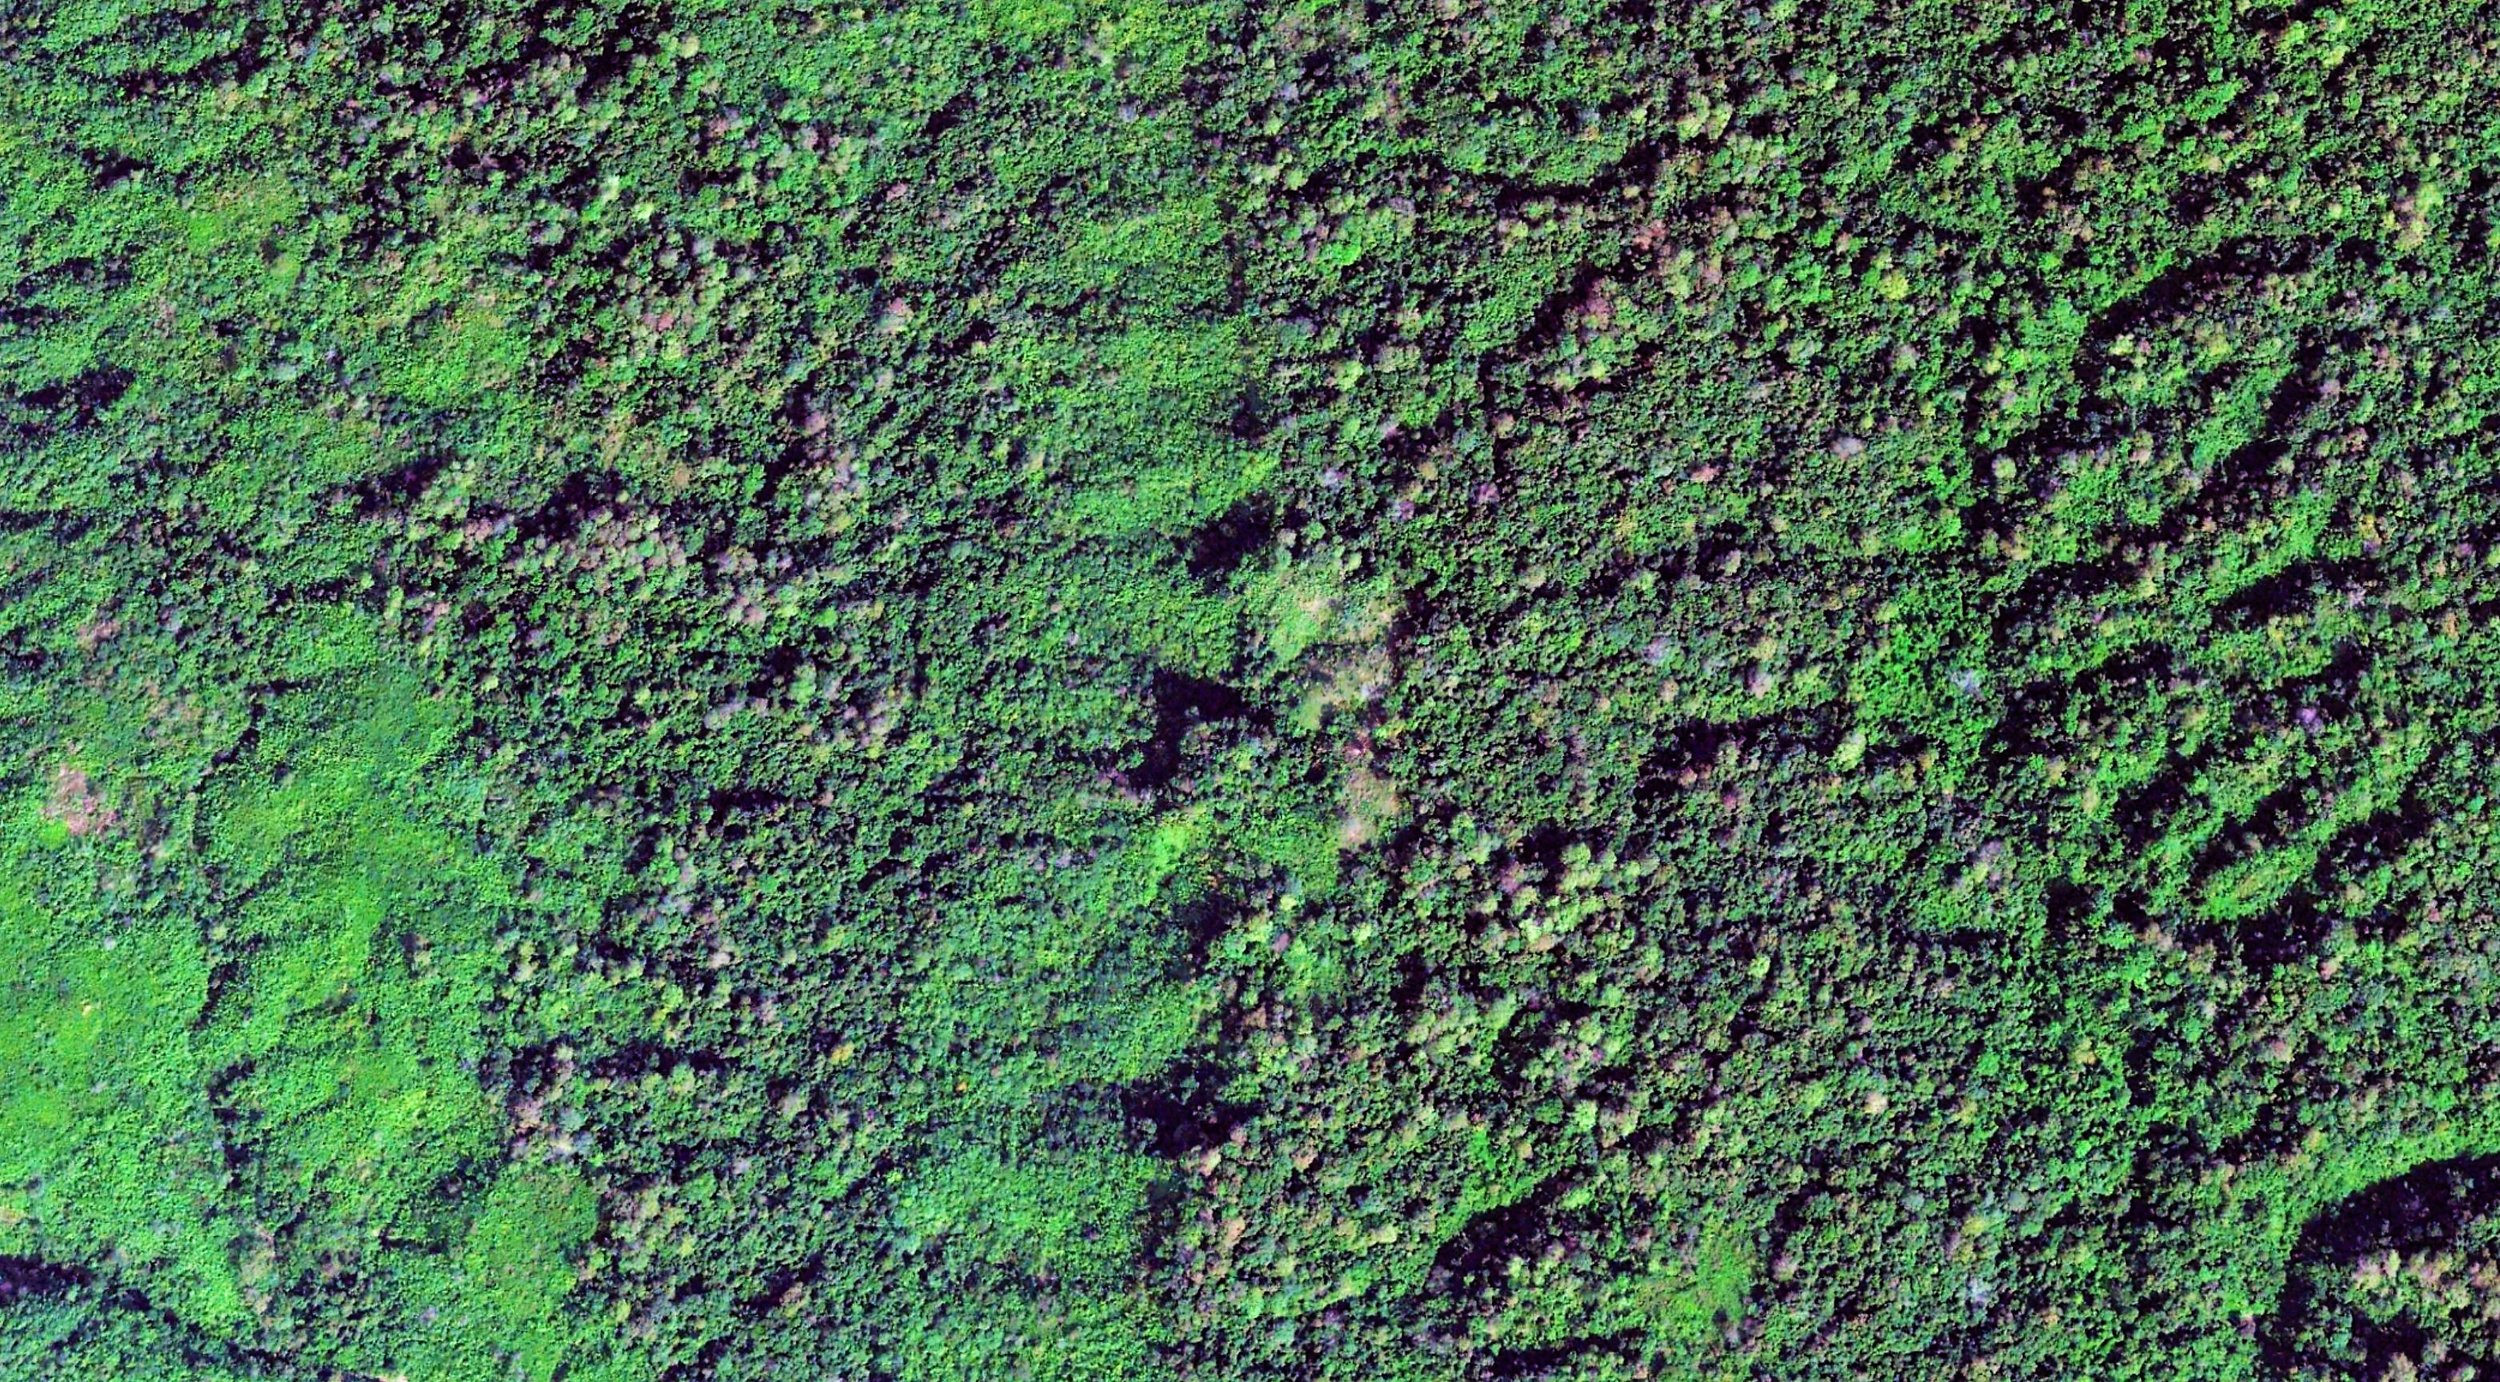 Tree species diversity of Pablakhali reserved forest. Image width: 1 kilometer